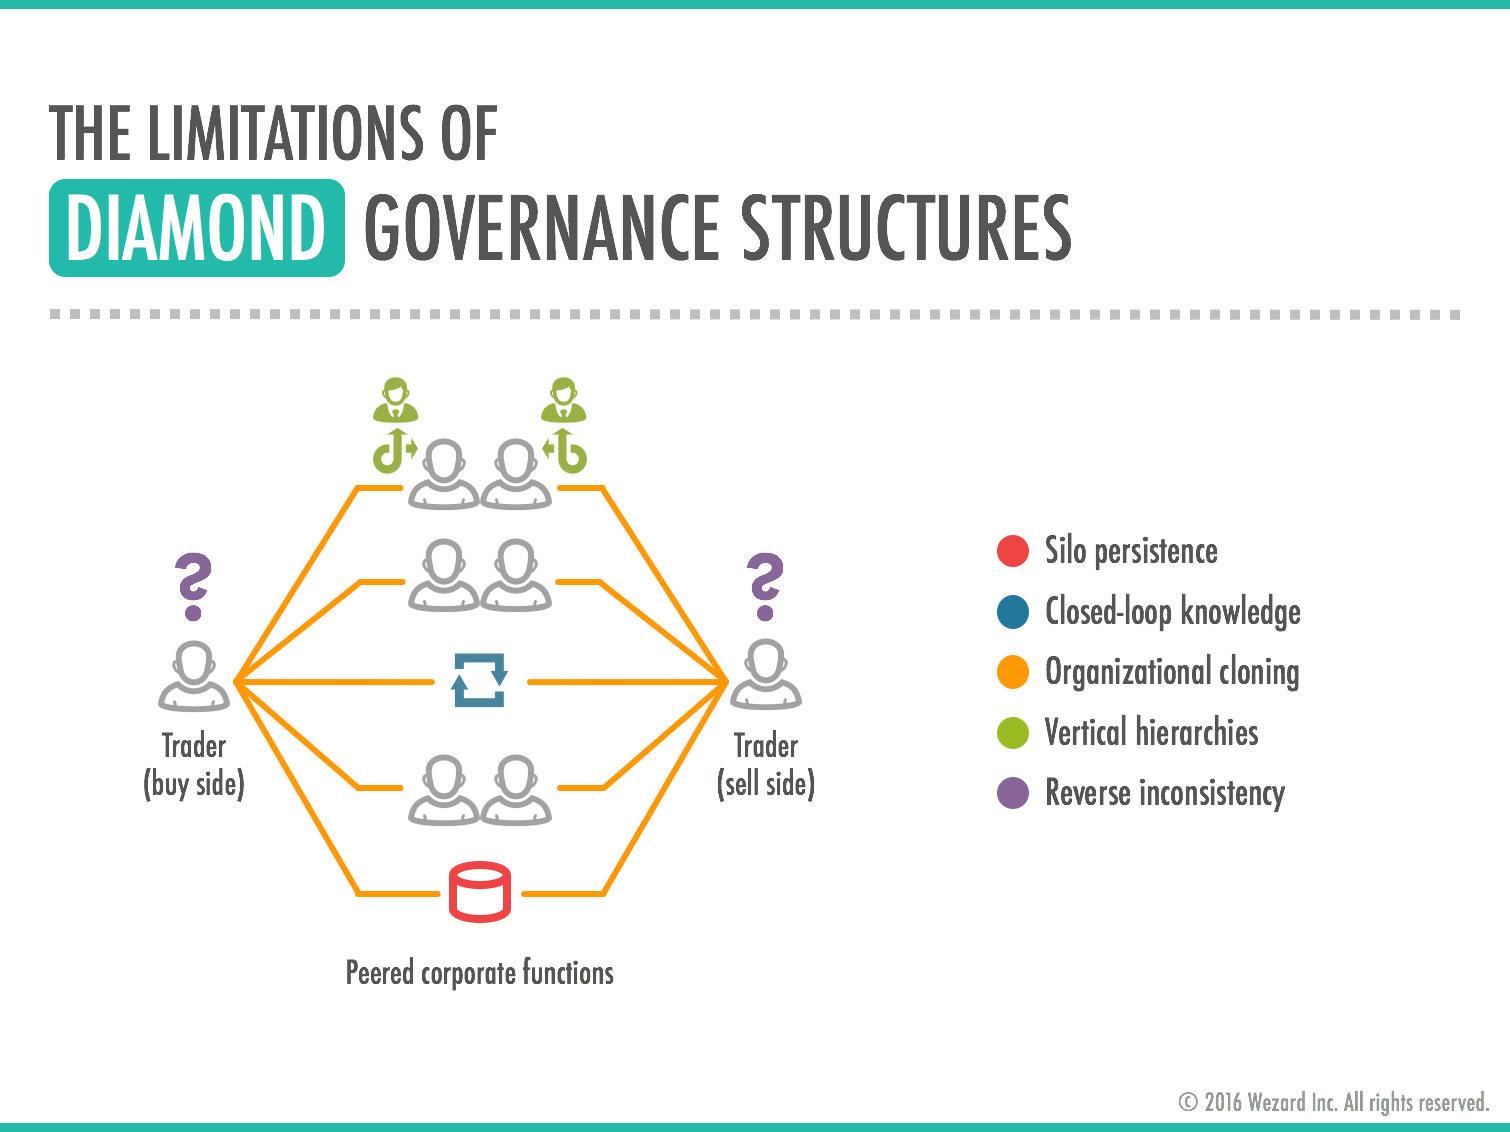 Wezard - The limitations of diamond governance structures